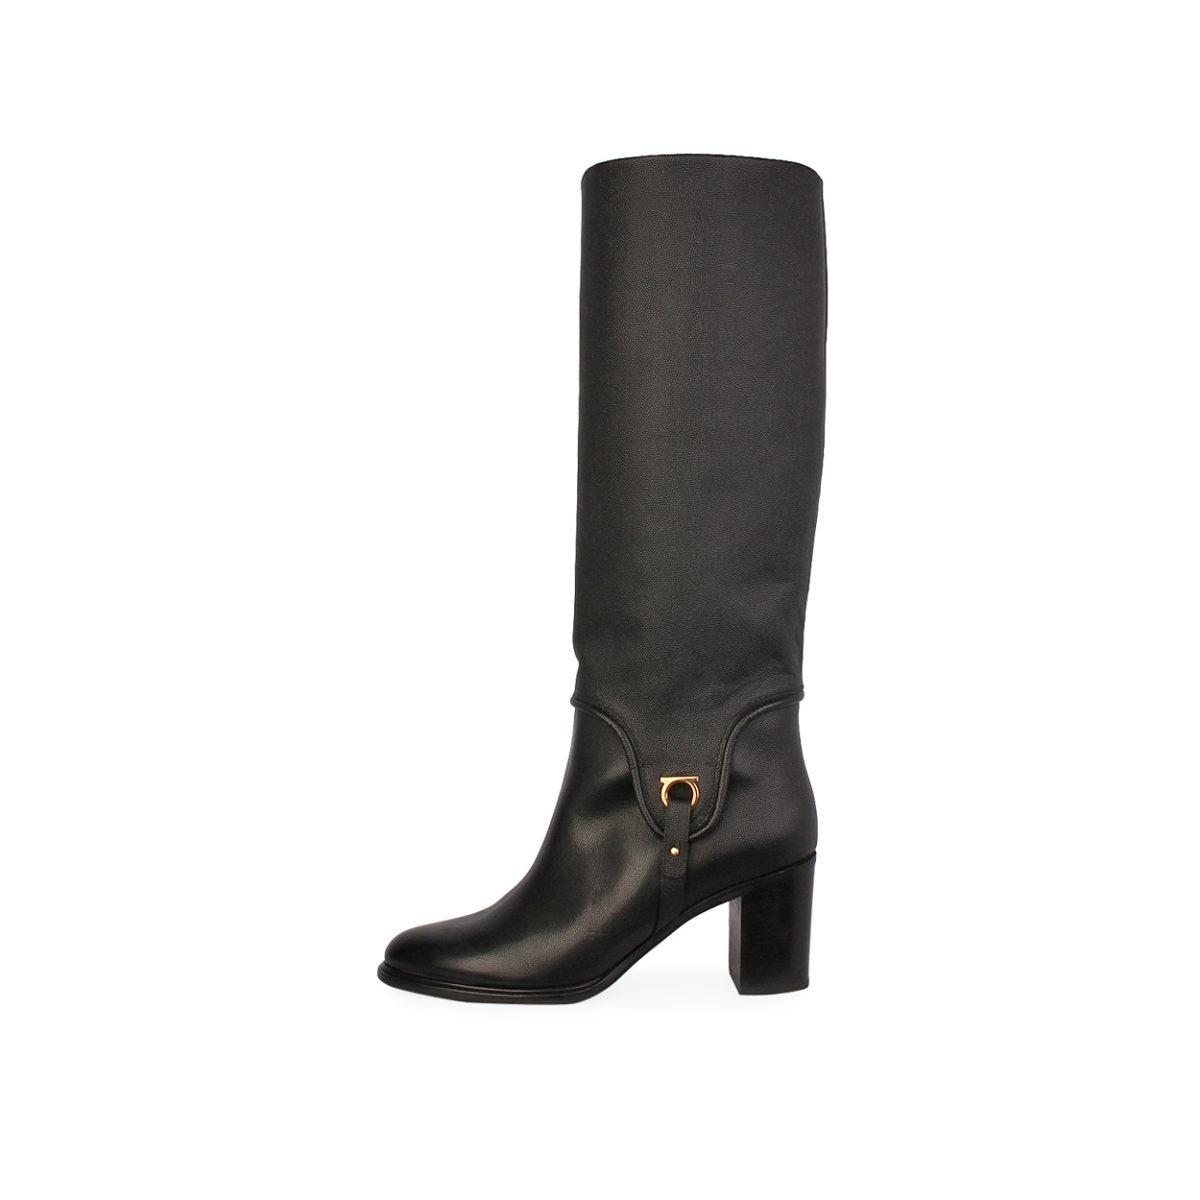 d16de4338c8d SALVATORE FERRAGAMO Pebbled Leather Flavius Block Heel Boots Black ...